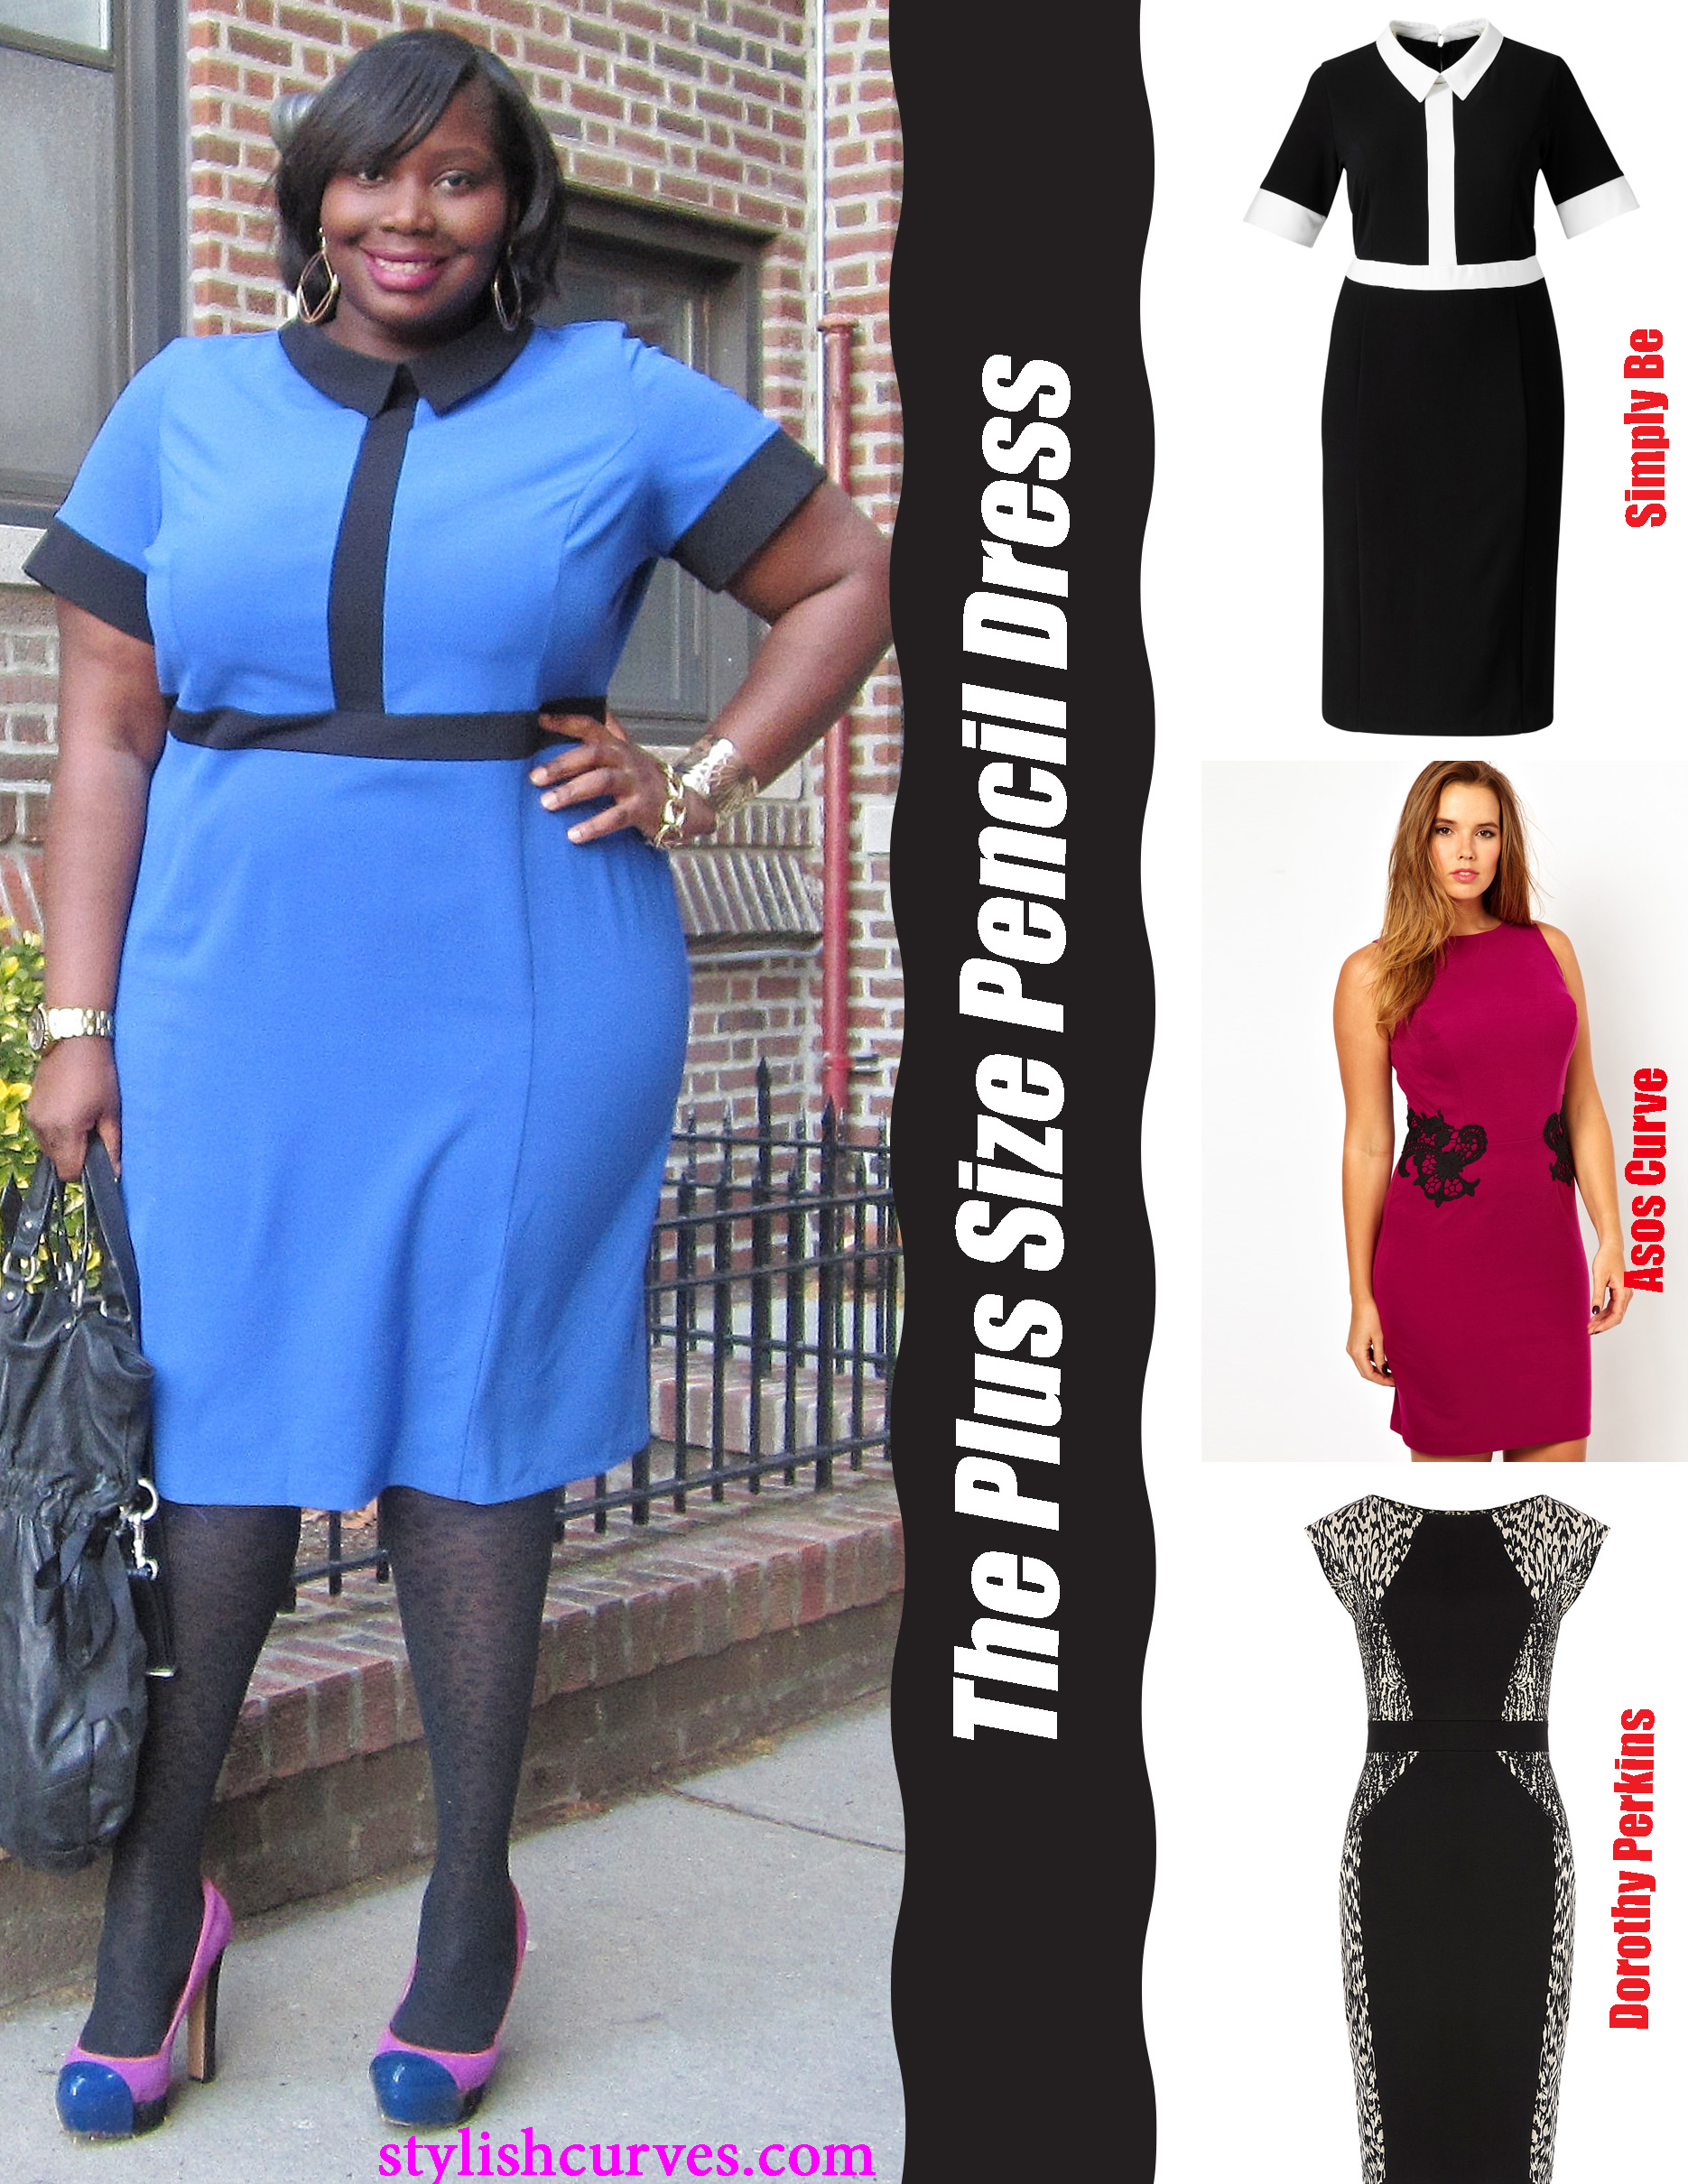 WORK-WEAR WEDNESDAY: THE PLUS SIZE PENCIL DRESS | Stylish Curves